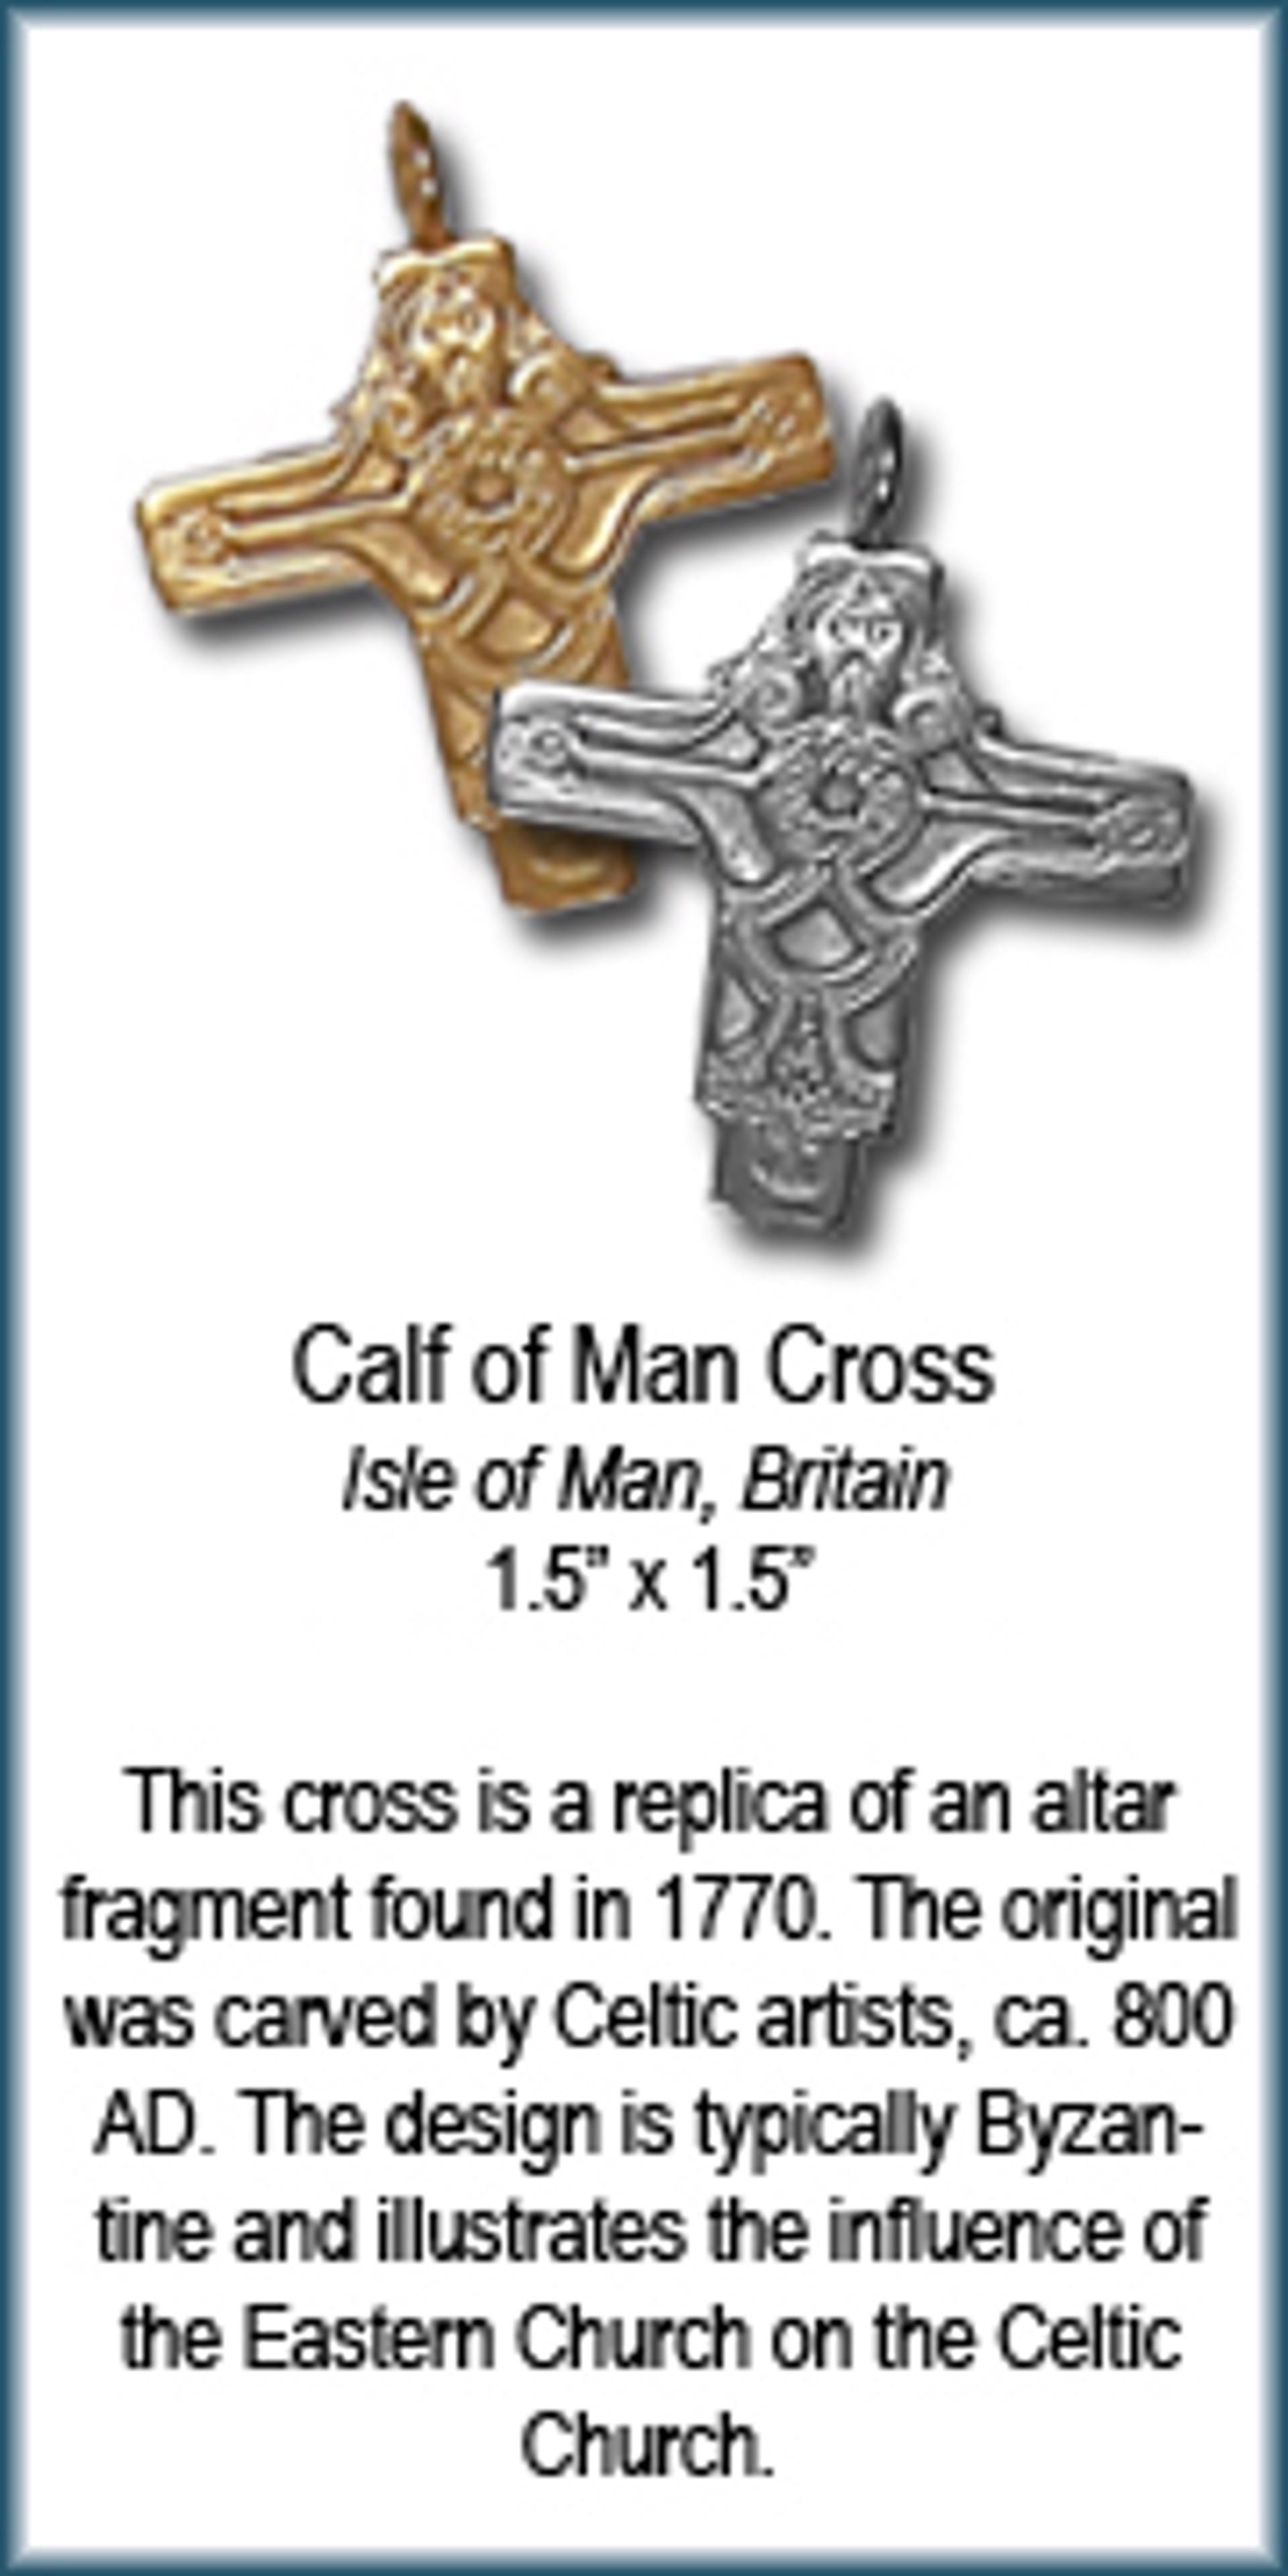 Pendant - Bronze Calf Of Man Cross 7566 by Deanne McKeown